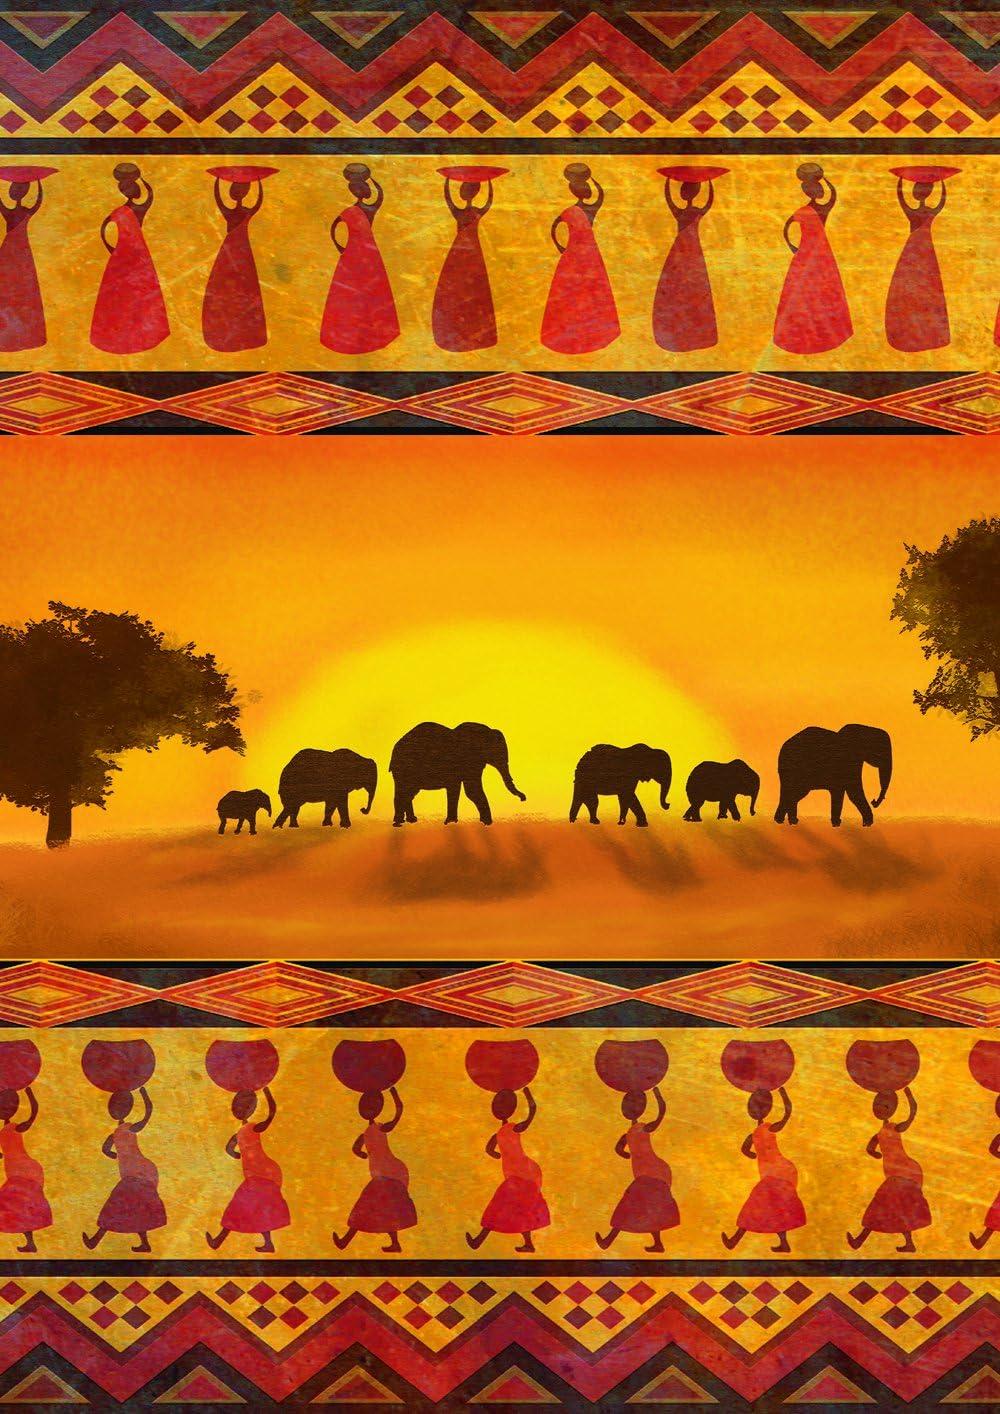 Toland Home Garden Savanna Sunset 12.5 x 18 Inch Decorative Colorful Exotic African Elephant Summer Garden Flag